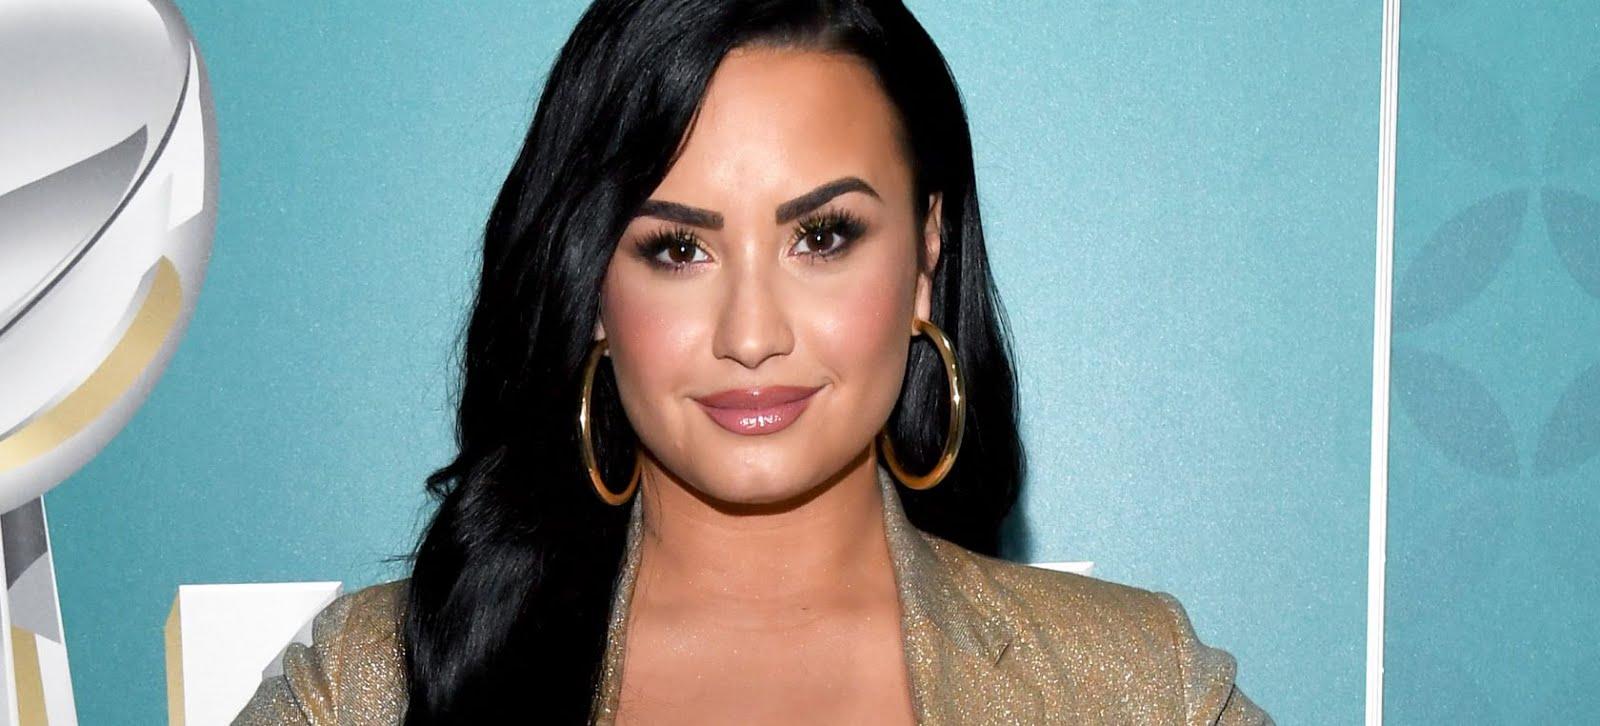 Demi Lovato parece que empieza a plantearse la maternidad